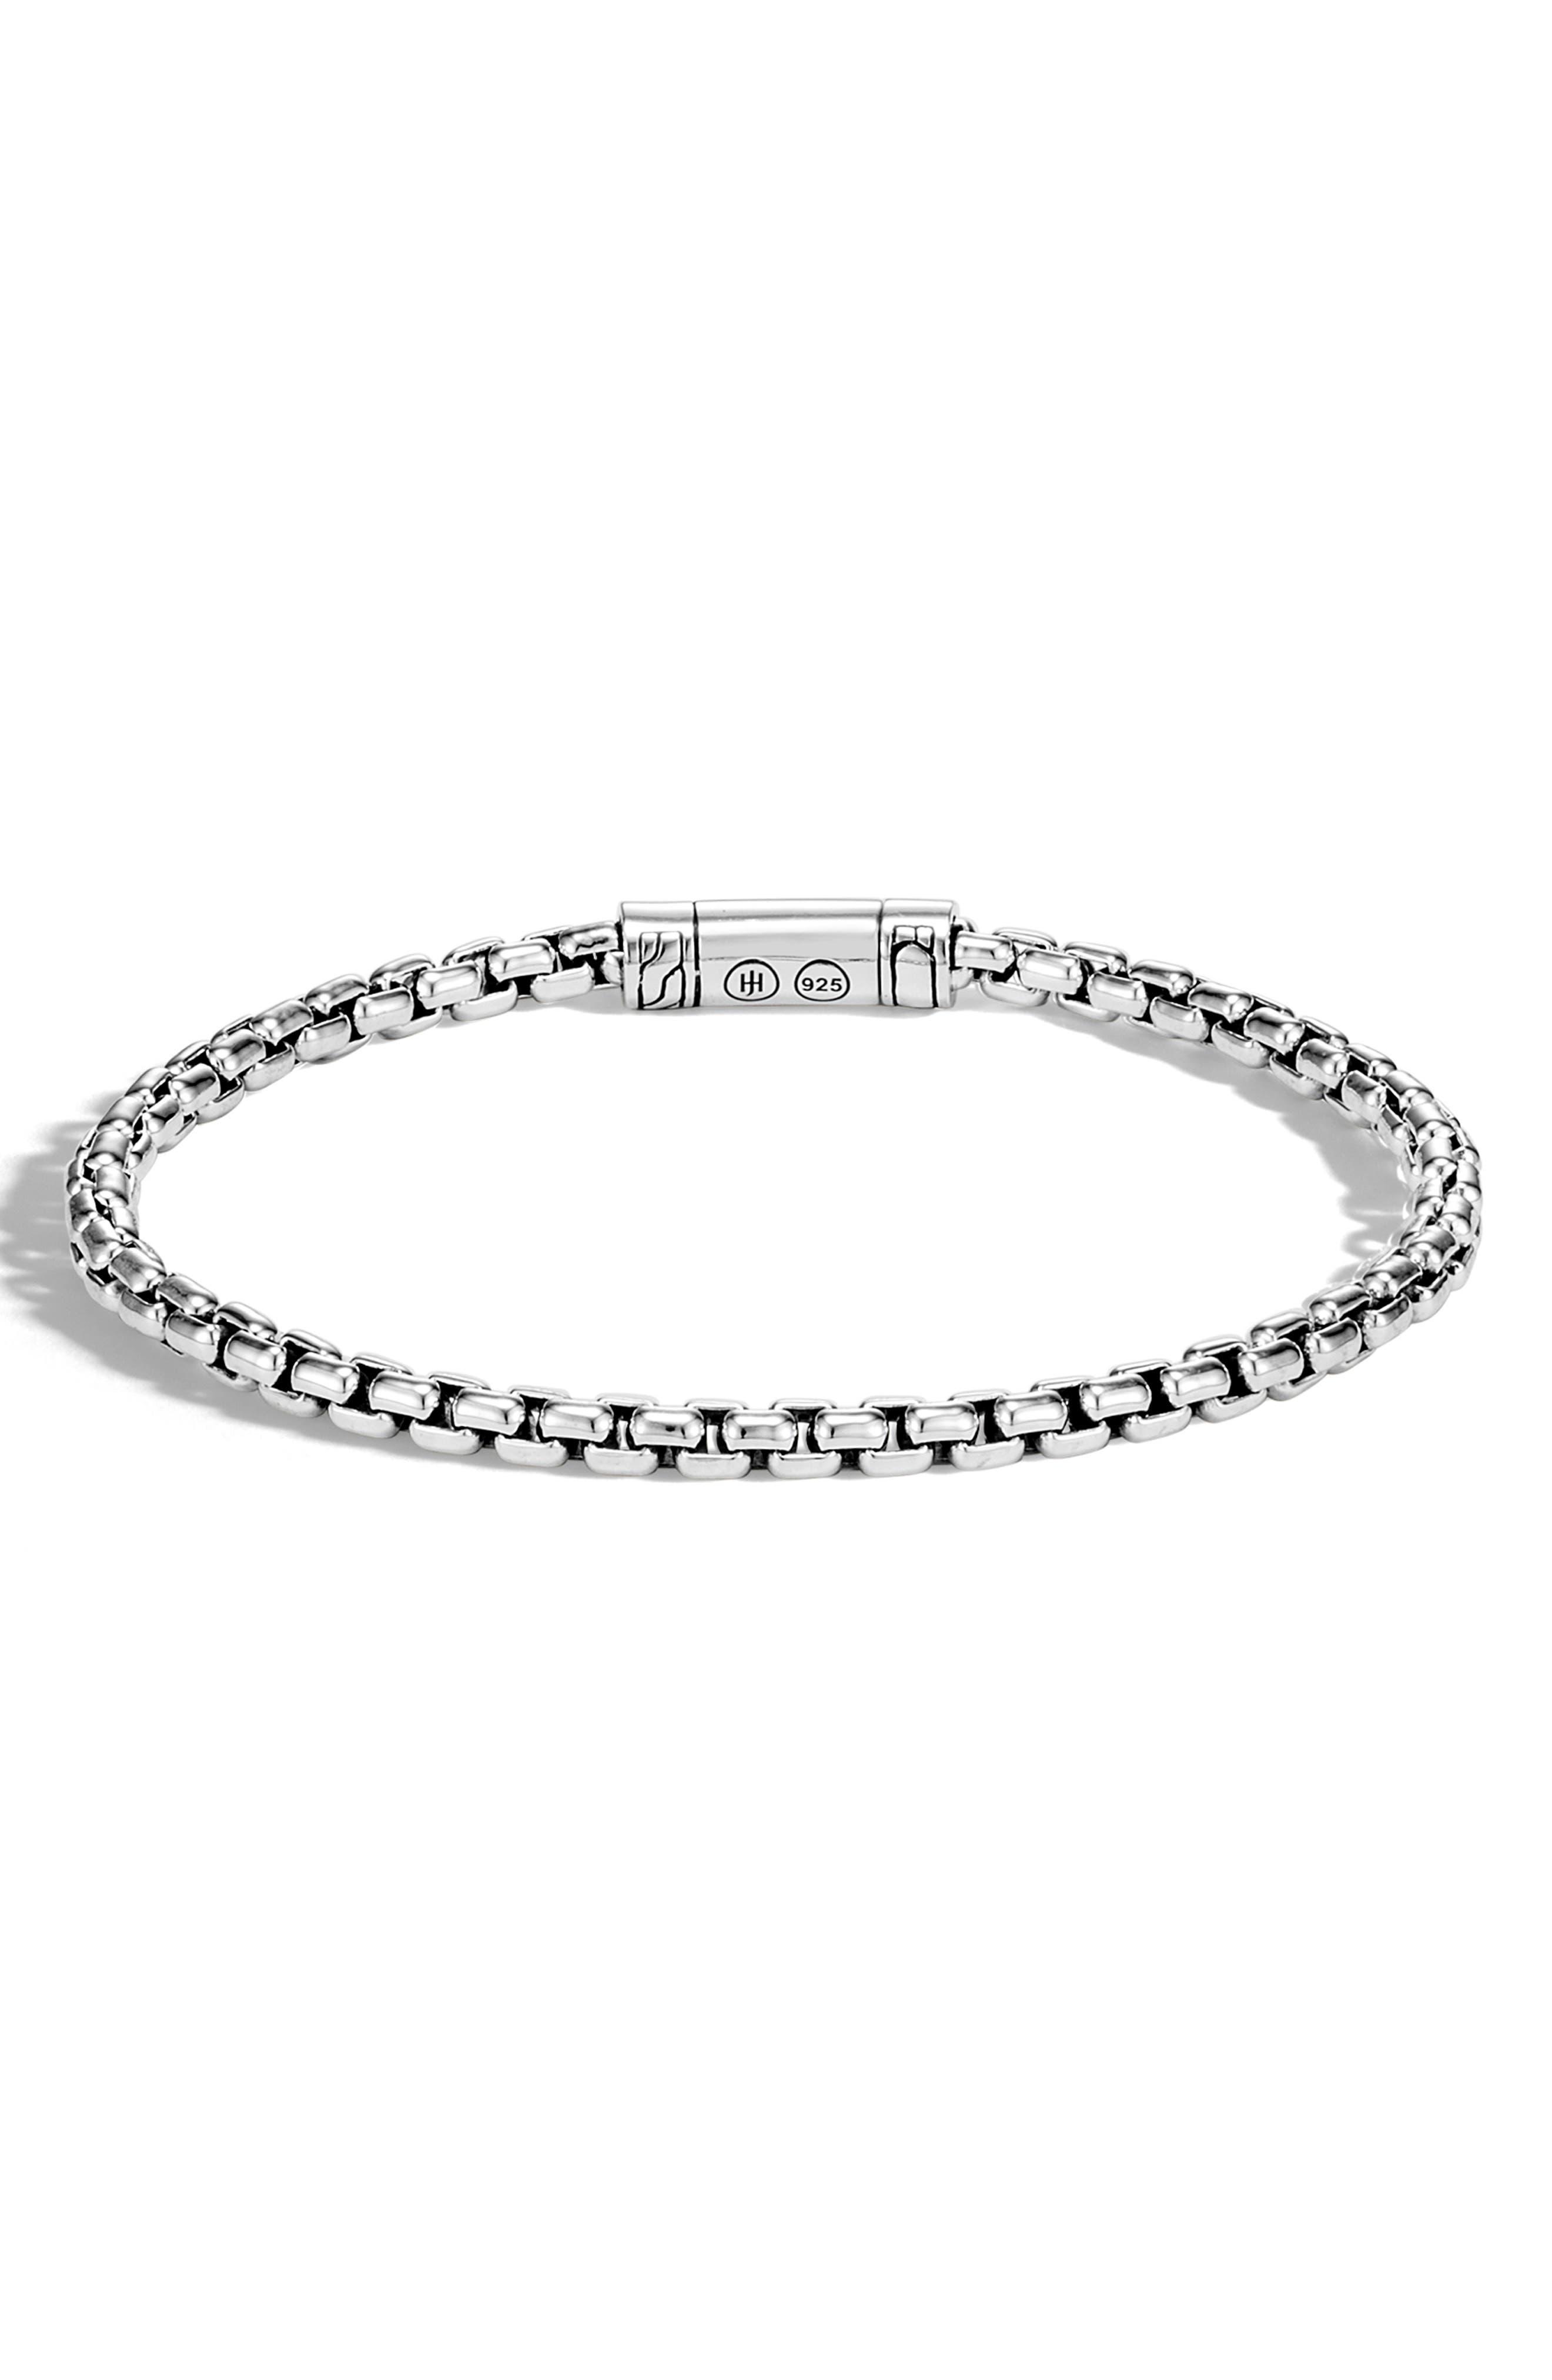 Men's Classic Sterling Silver Box Chain Bracelet,                             Main thumbnail 1, color,                             SILVER